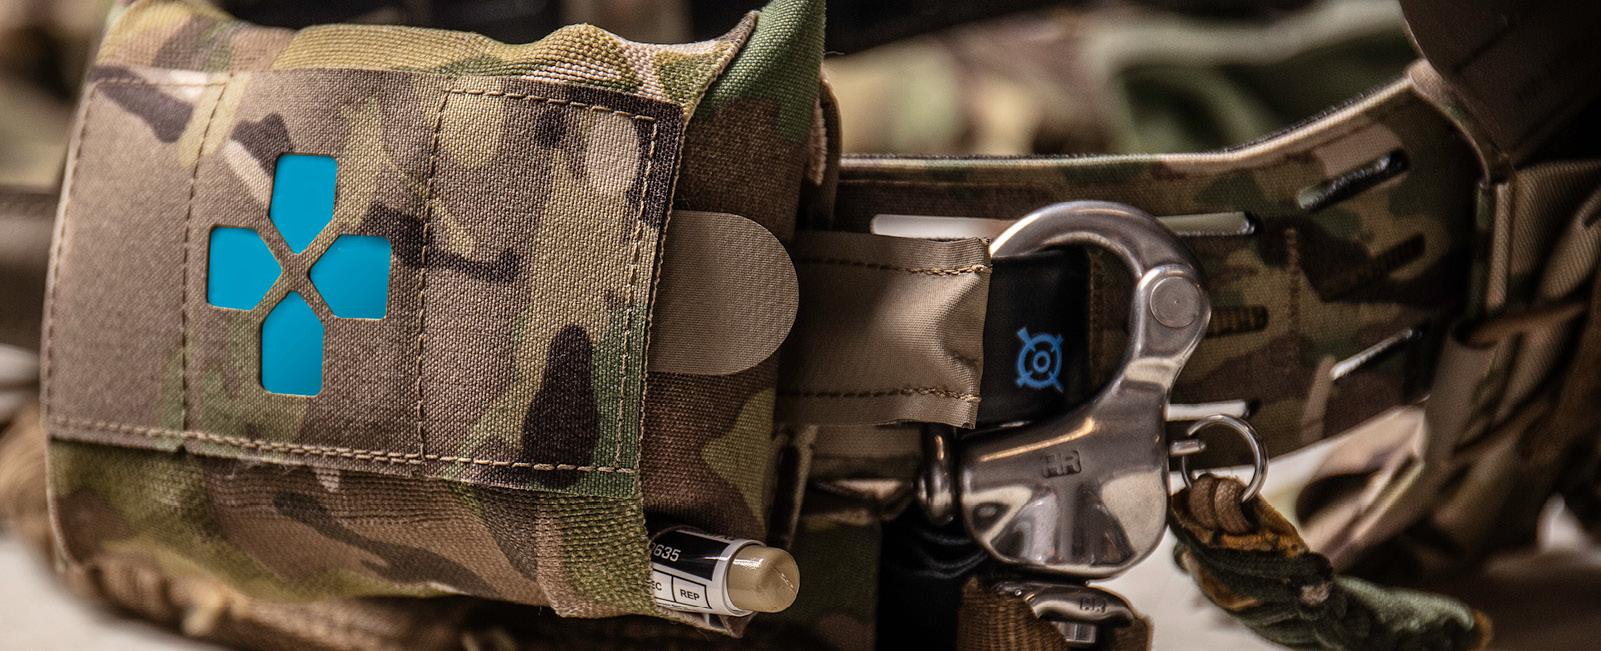 Micro Trauma Kit on CHLK Belt